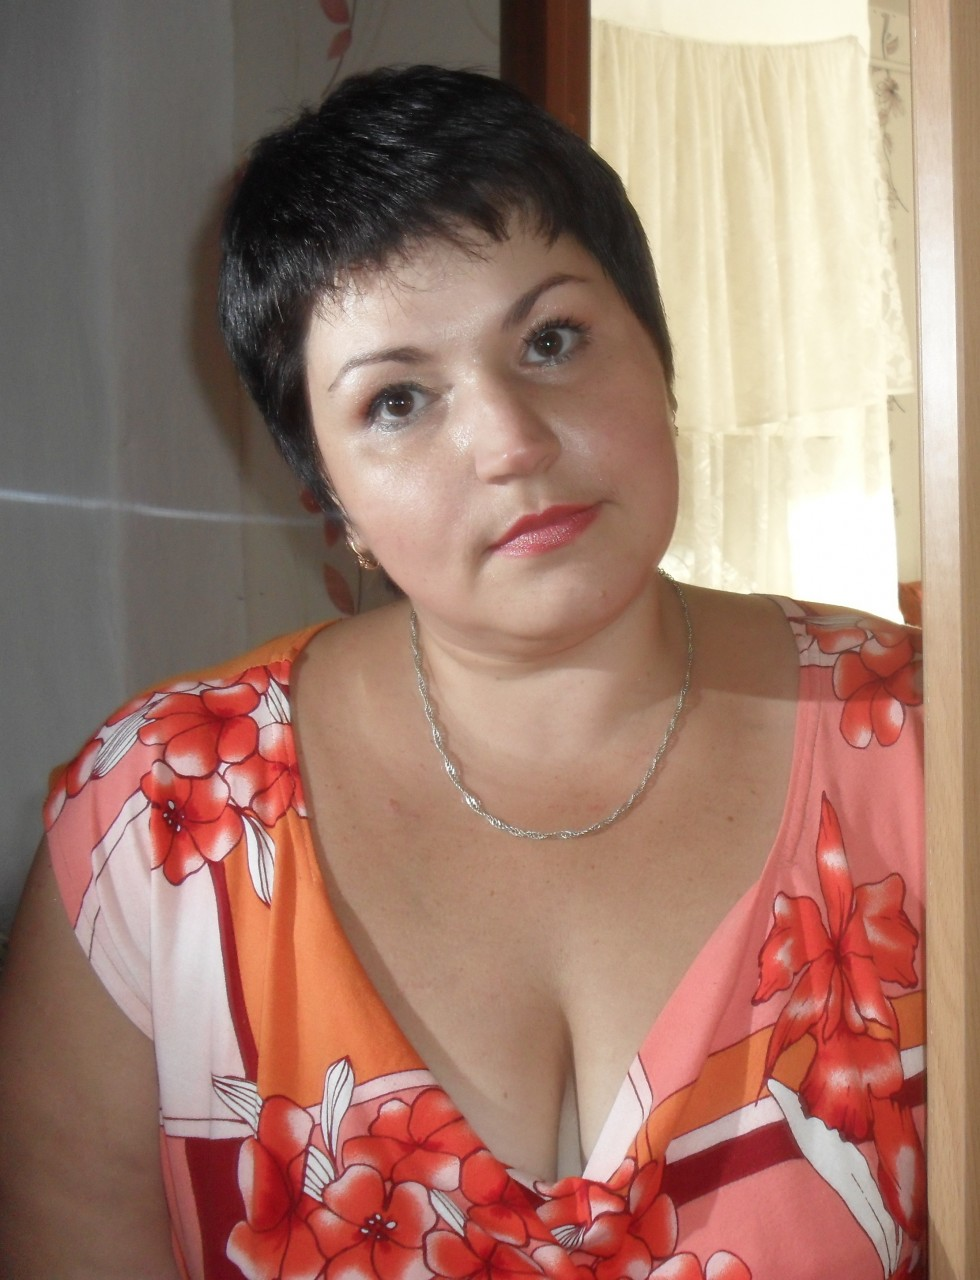 Знакомства С Дамами Фото Телефон Без Регистрации